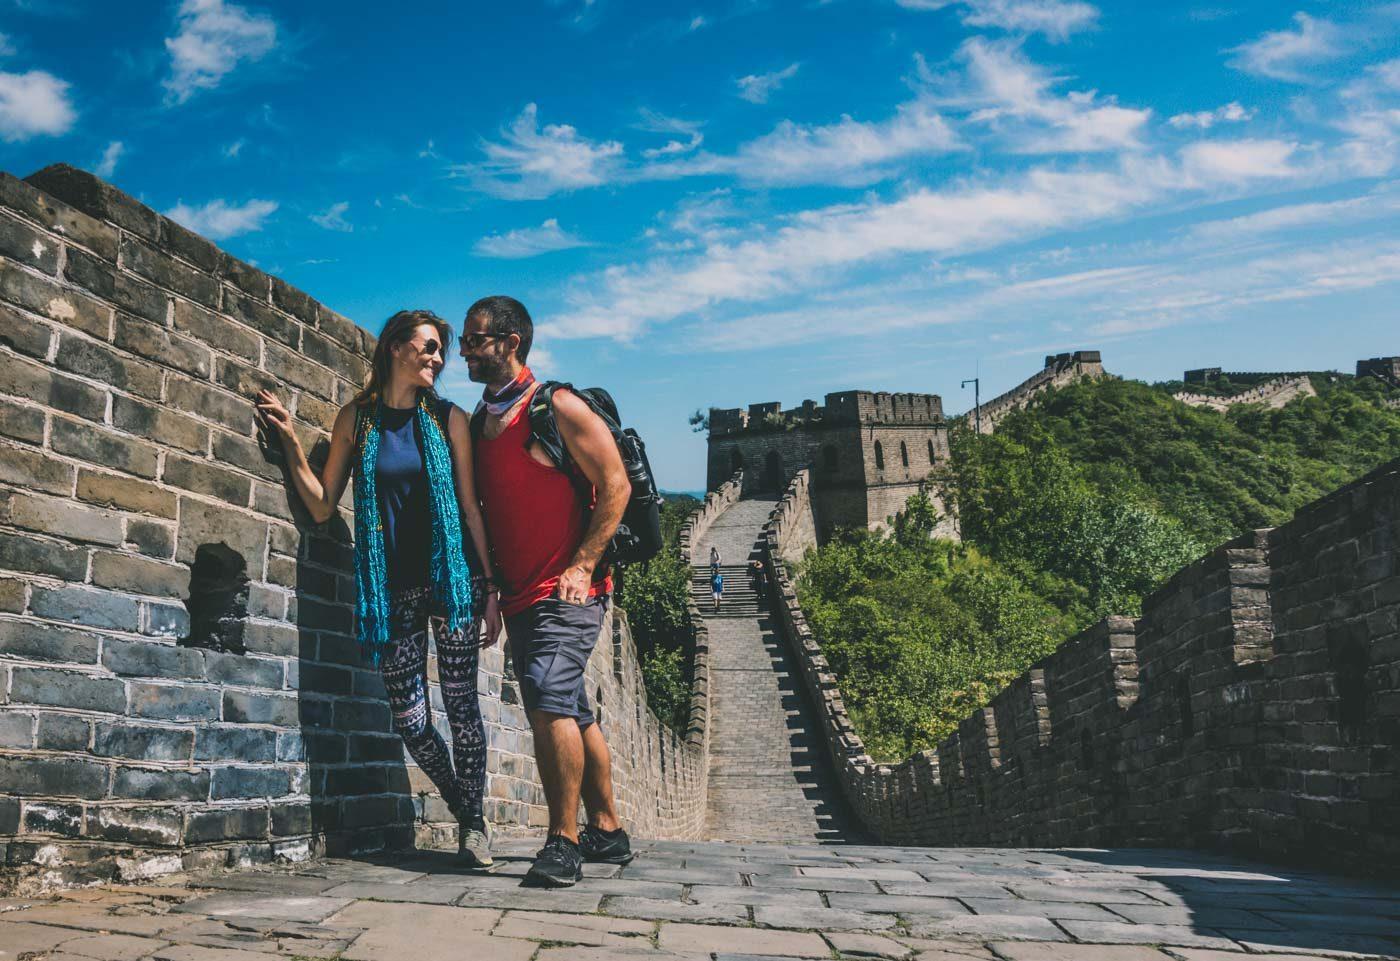 Oksana & Max hiking on the Great Wall of China